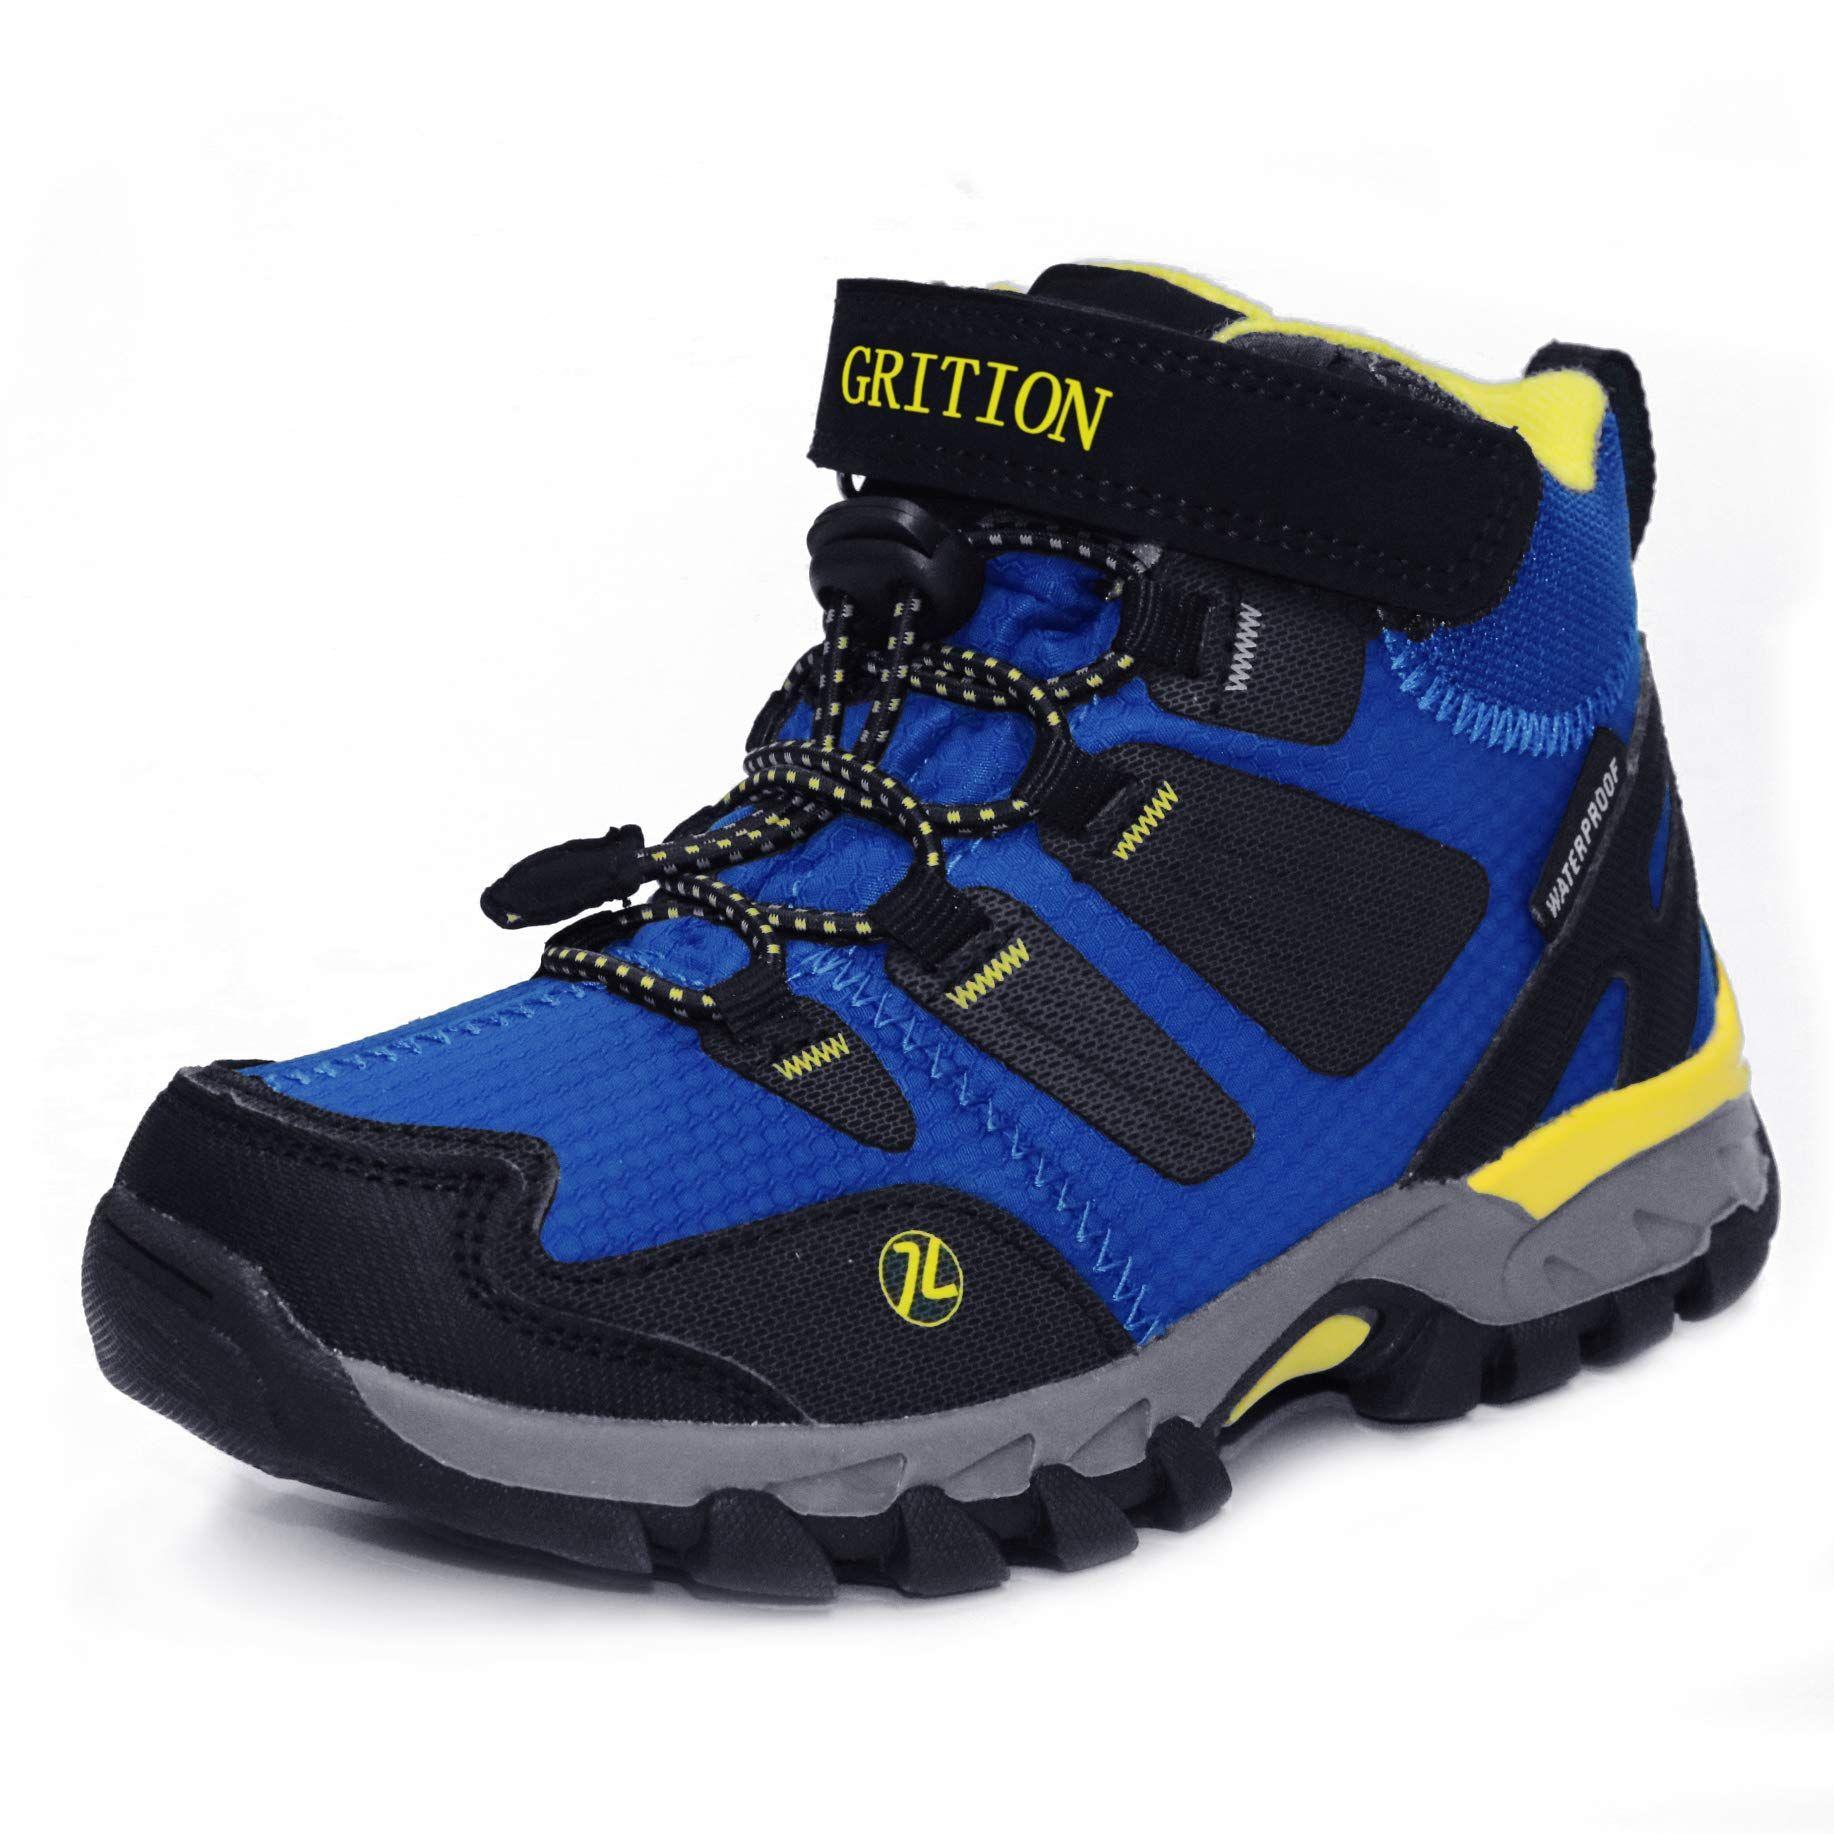 GRITION Kids Hiking Boots Boys Waterproof Winter Walking Boots Hook and  Loop School Shoes Anti Slip Unisex Ou…   Boys hiking boots, Kids hiking  boots, Walking boots